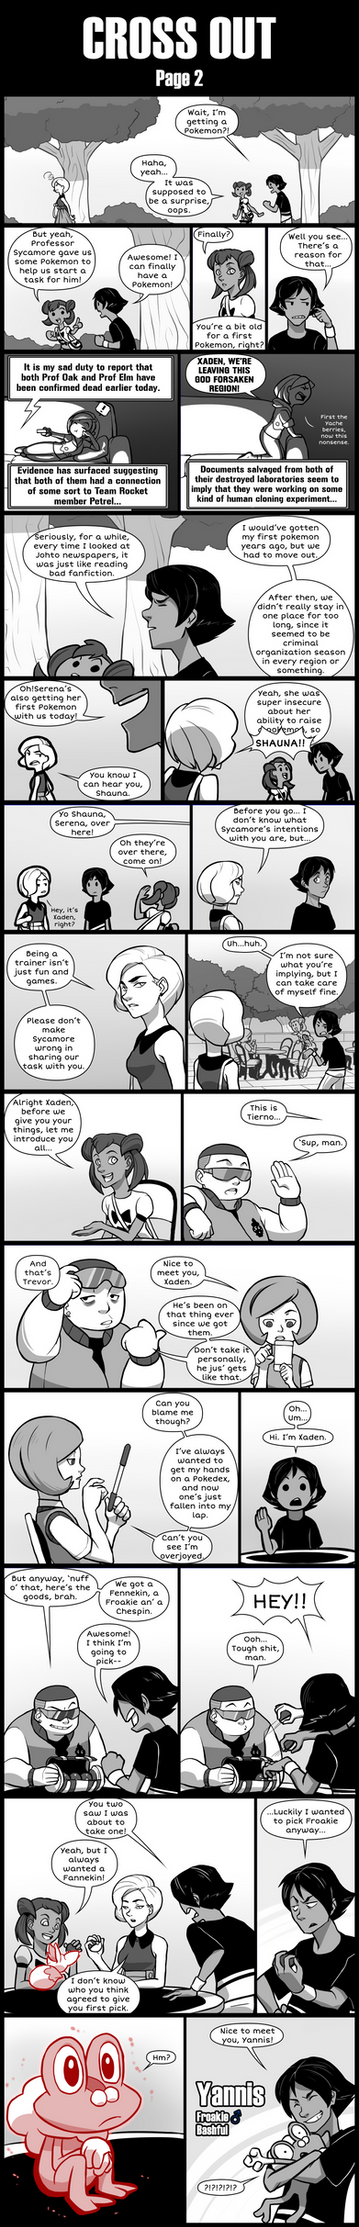 Cross Out [Pokemon X blind nuzlocke] page 2 by Protocol00